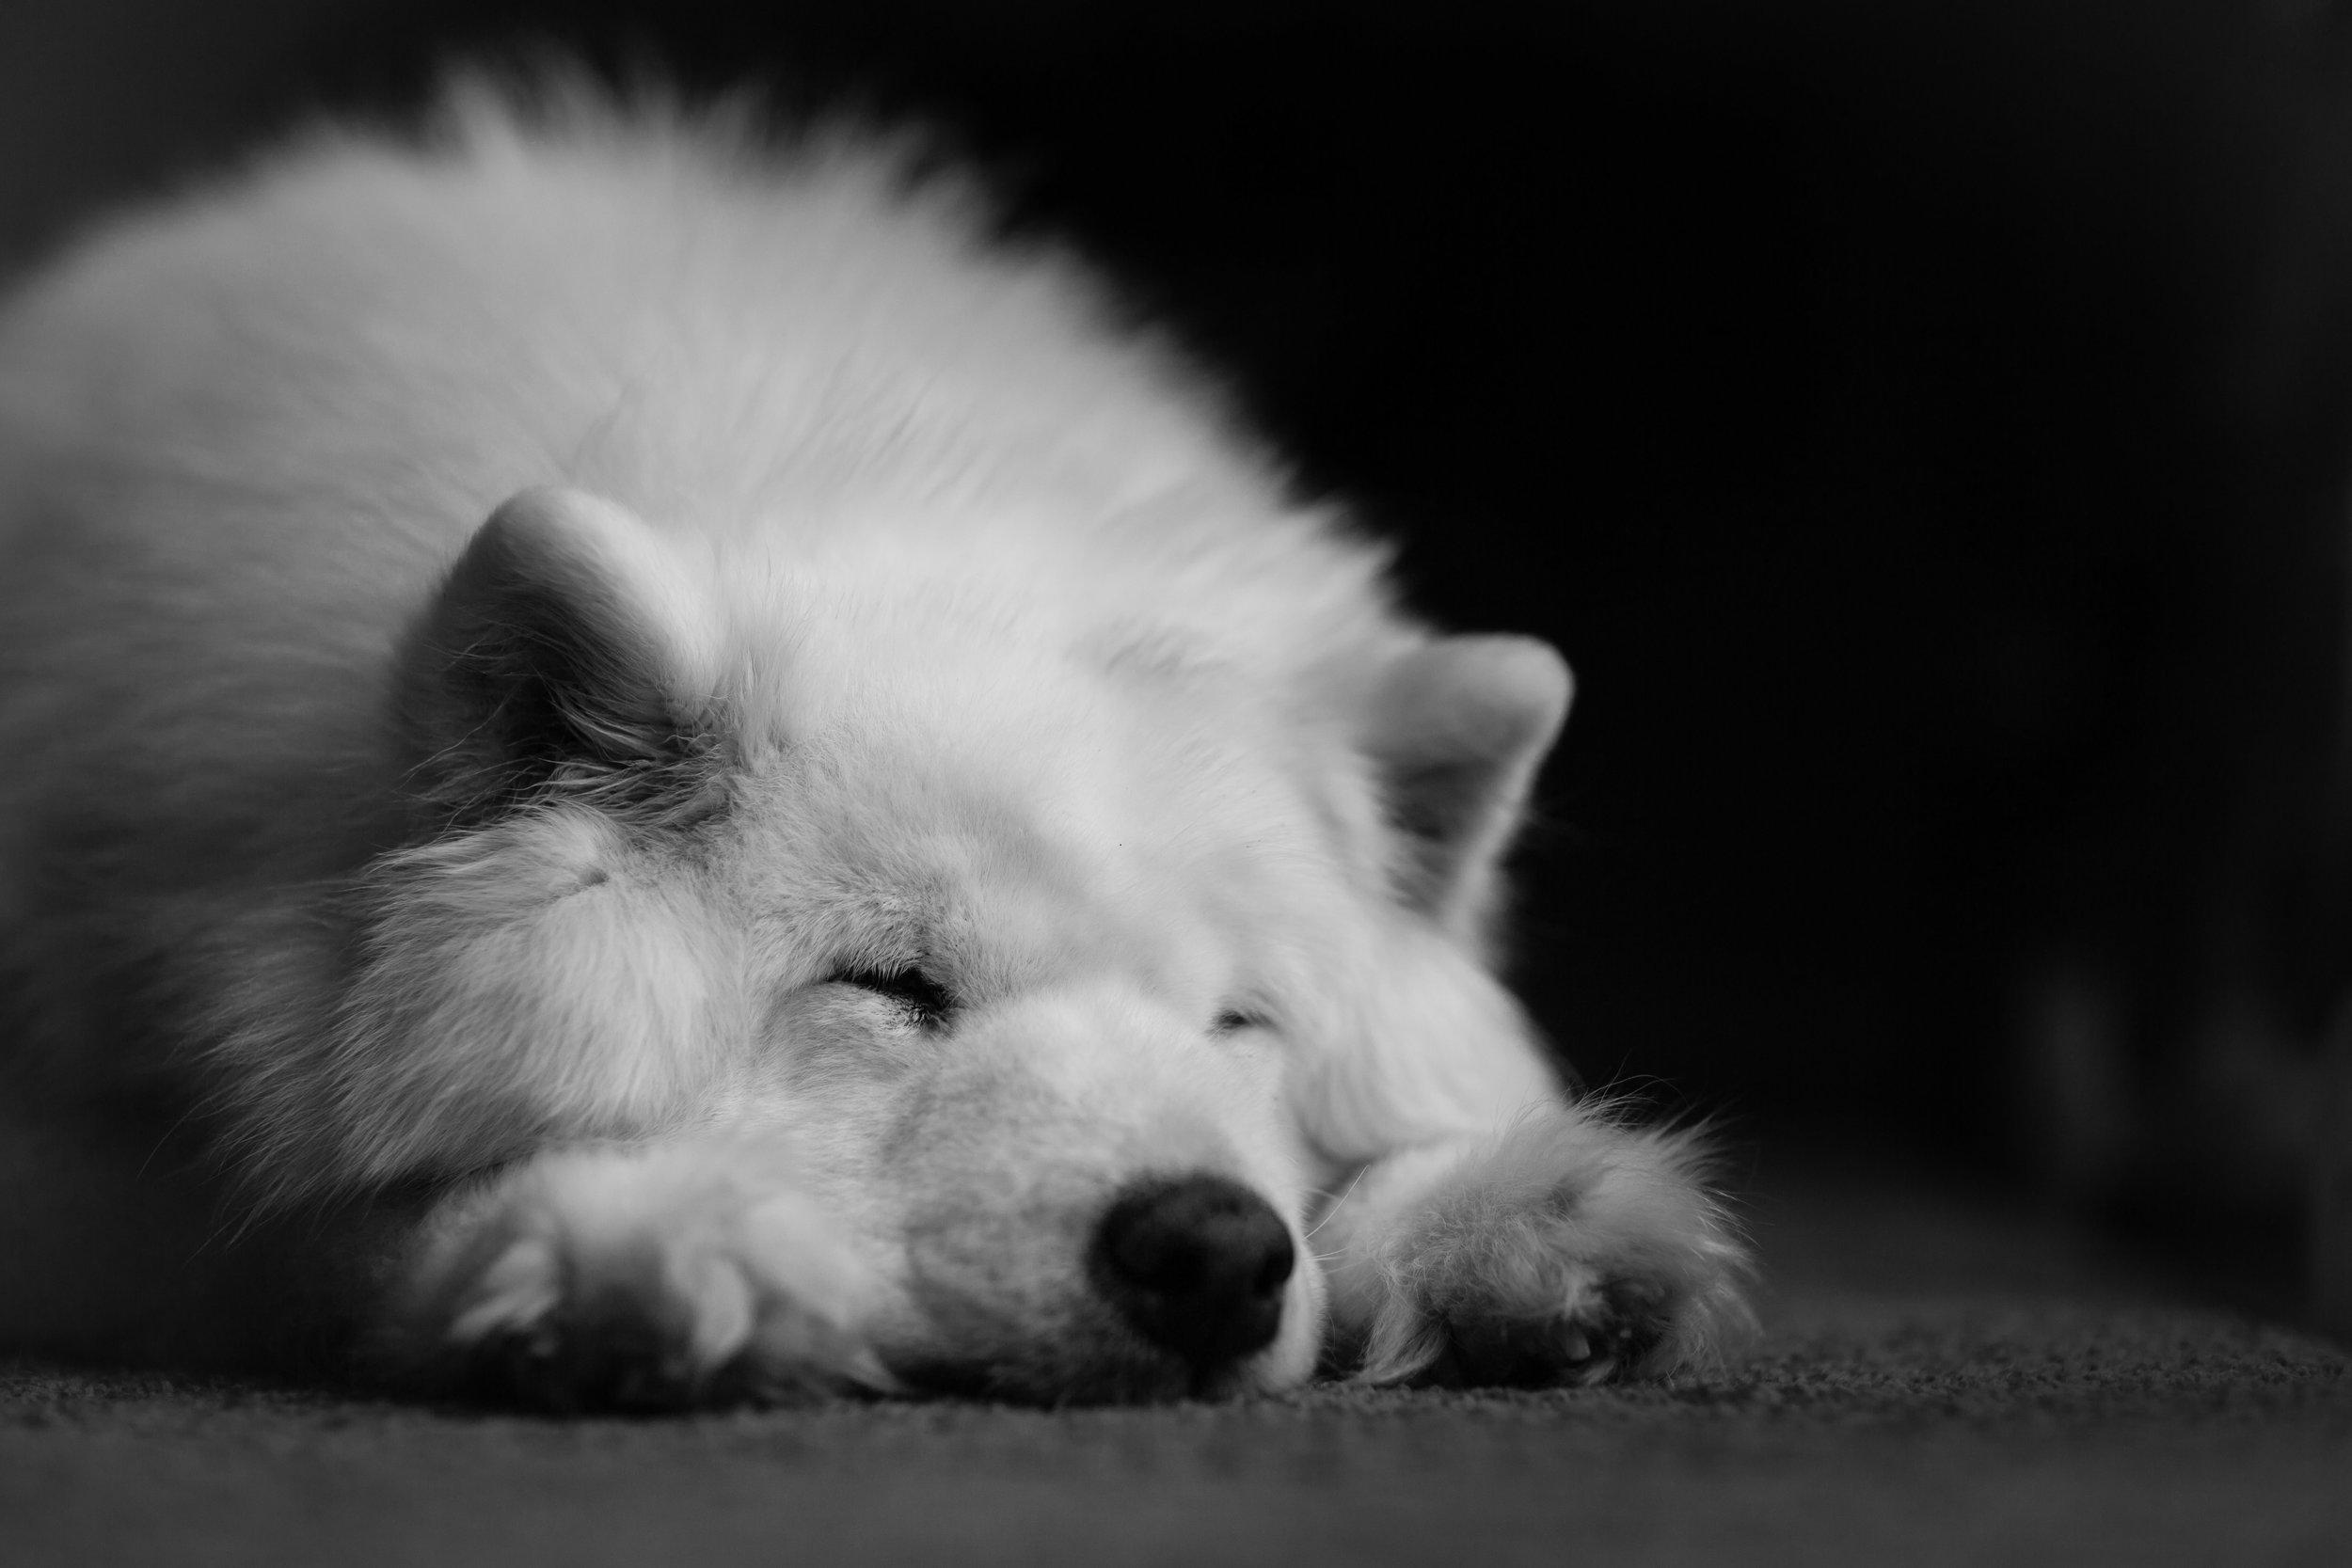 best_pet_portrait_photographer_potomac_MD_samoyed_dog_sleeping.jpg